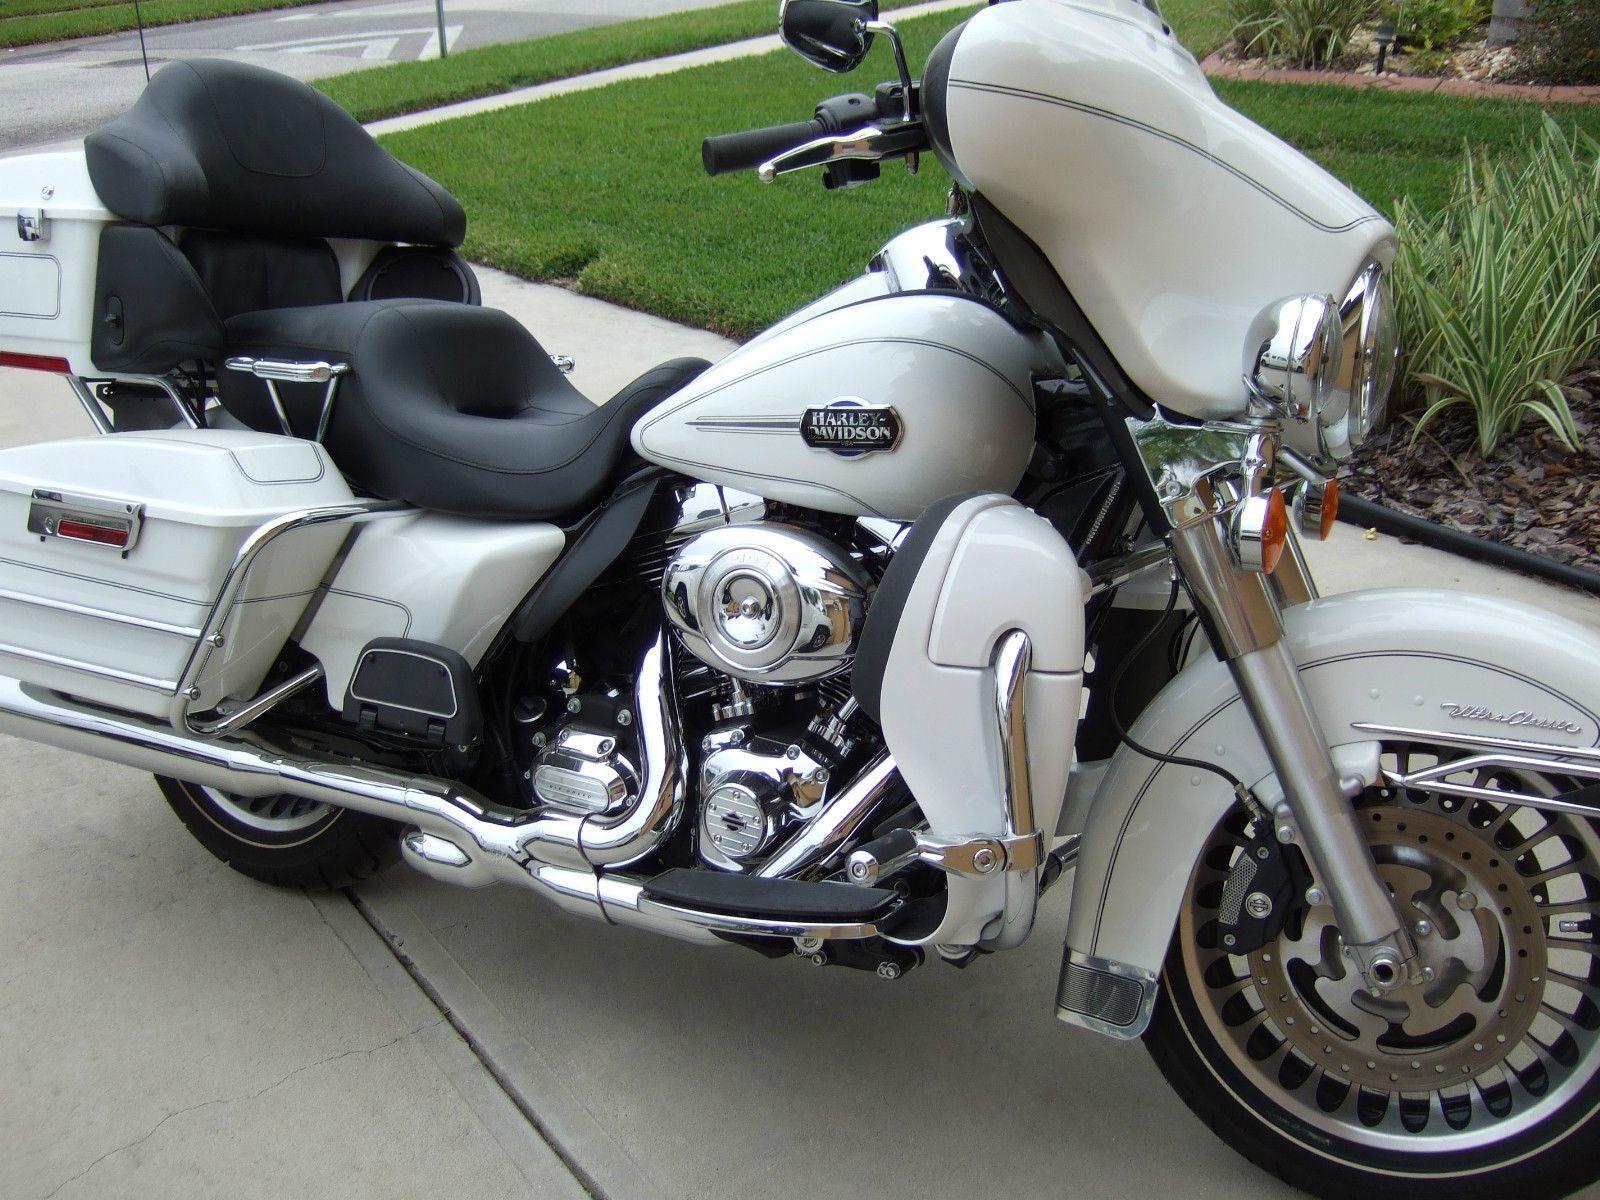 Harley davidson touring harley davidson 2013 white flhtcu ultra classic motorcycle hdnaughtylist